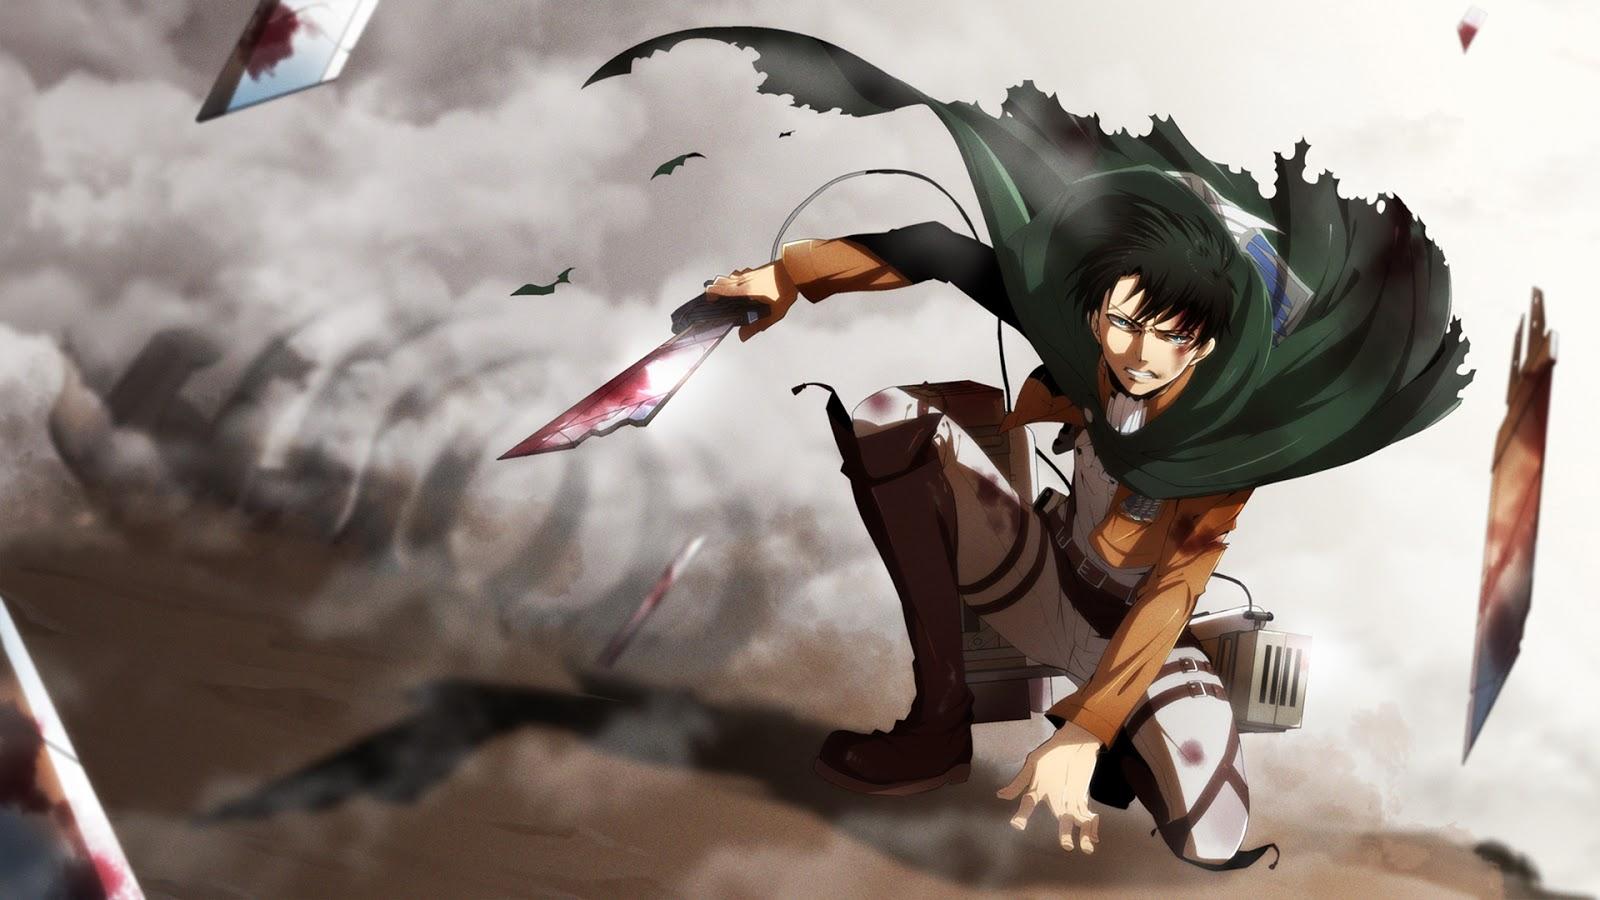 levi attack on titan shingeki no kyojin anime hd wallpaper 1600x900